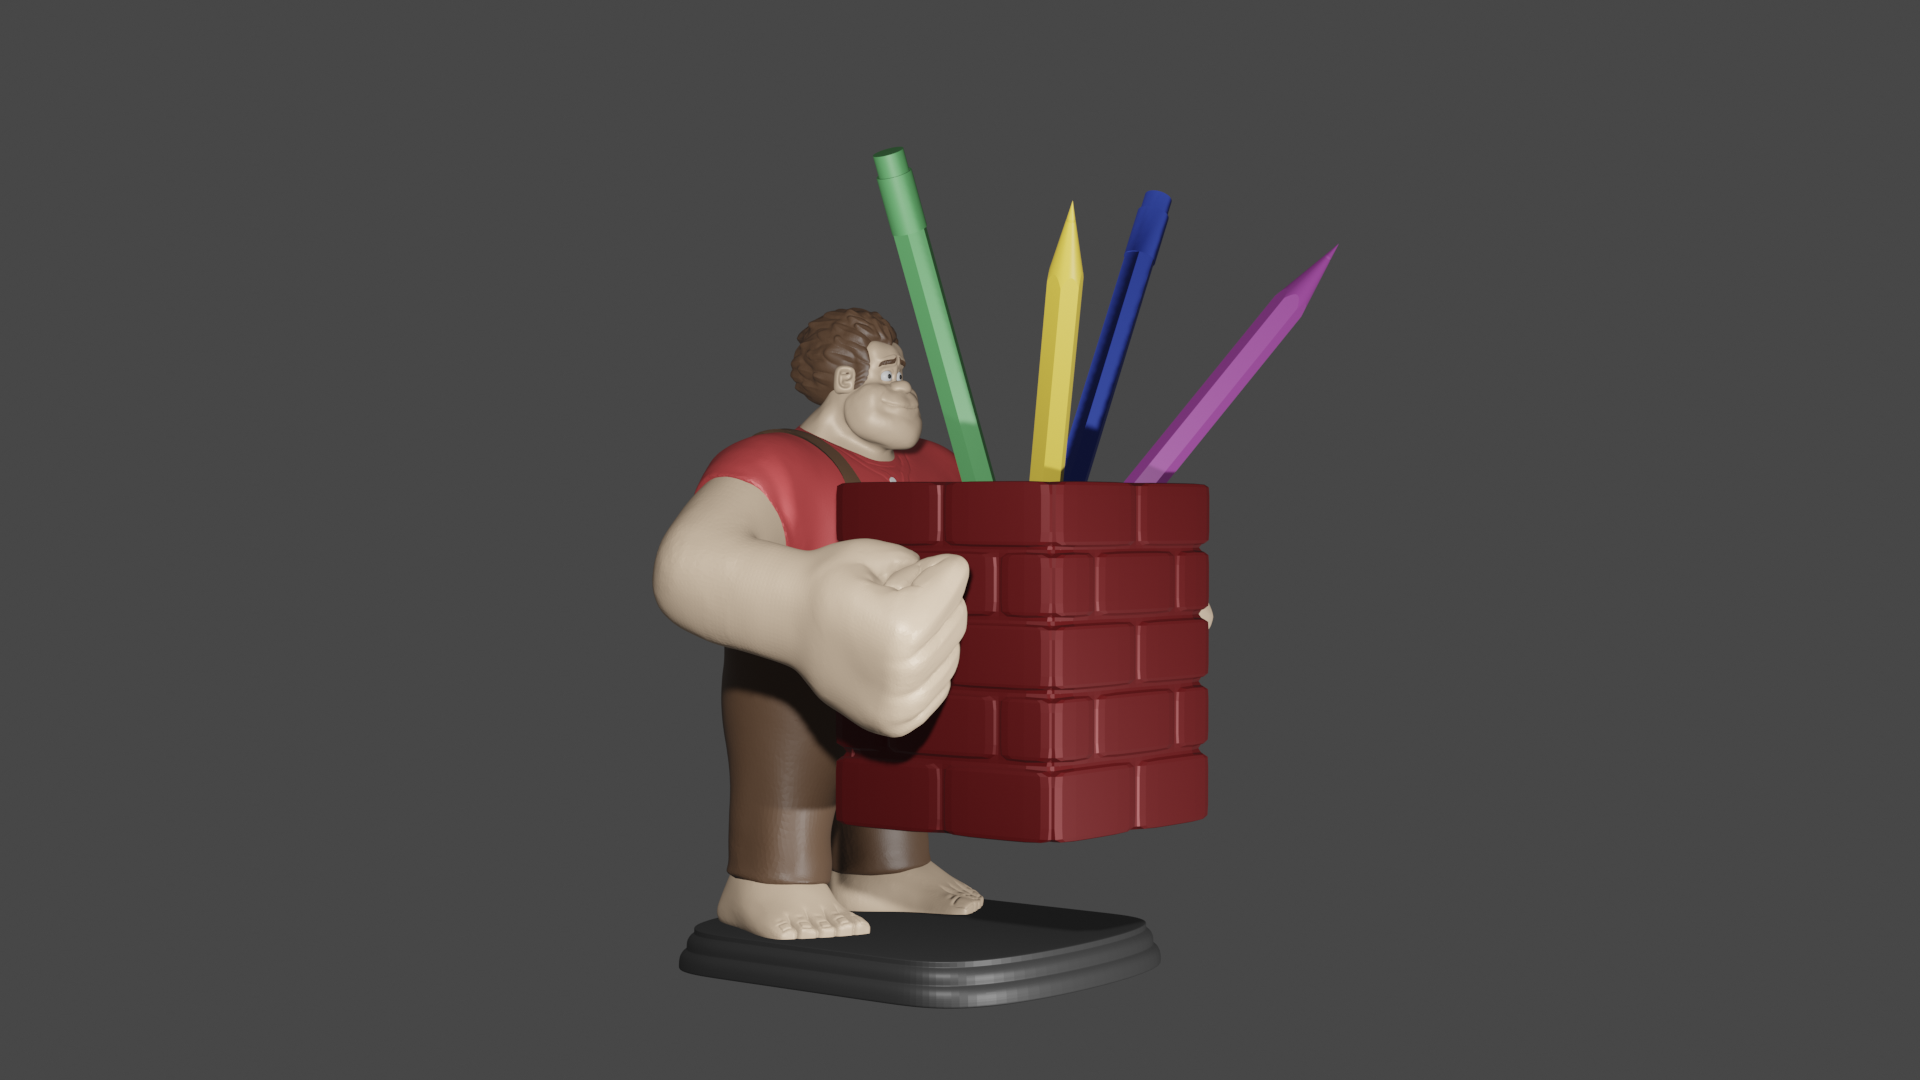 3 ralph.png Download free STL file Ralph the Feather Wrecker • 3D printer design, Aslan3d